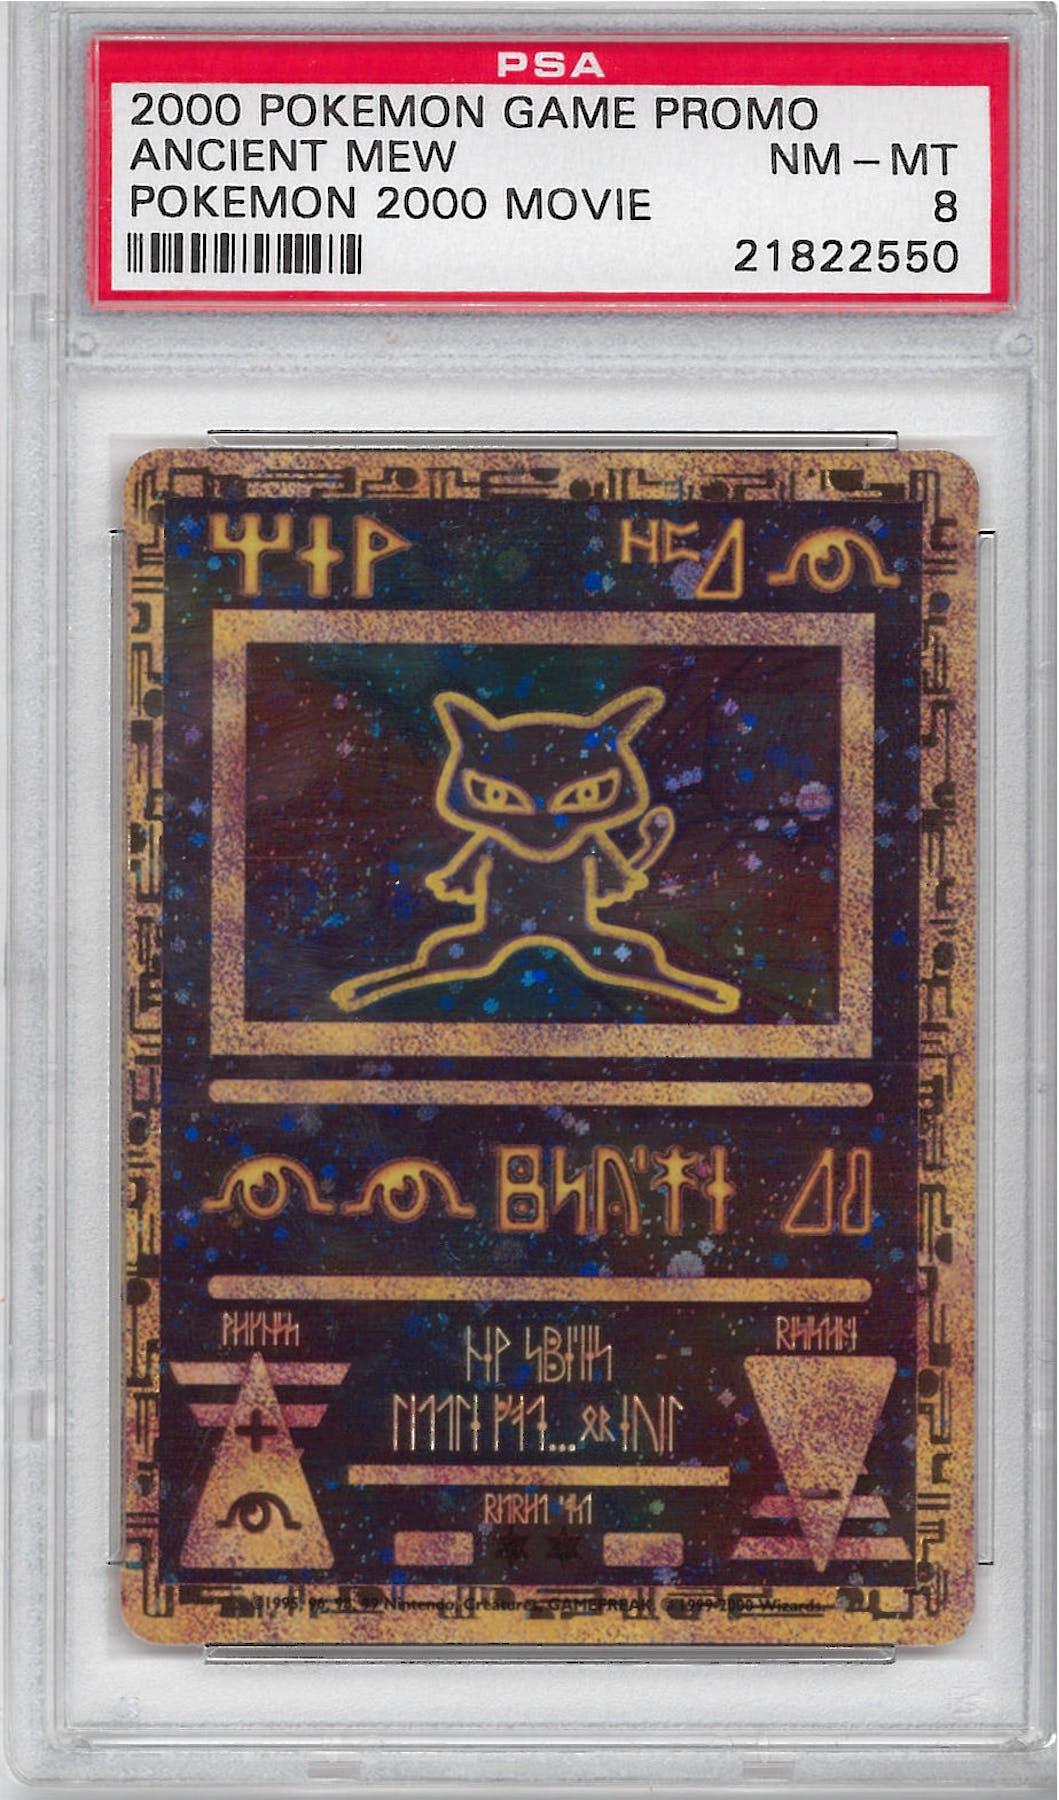 Pokemon Promo Single Ancient Mew Psa 8 21822550 Da